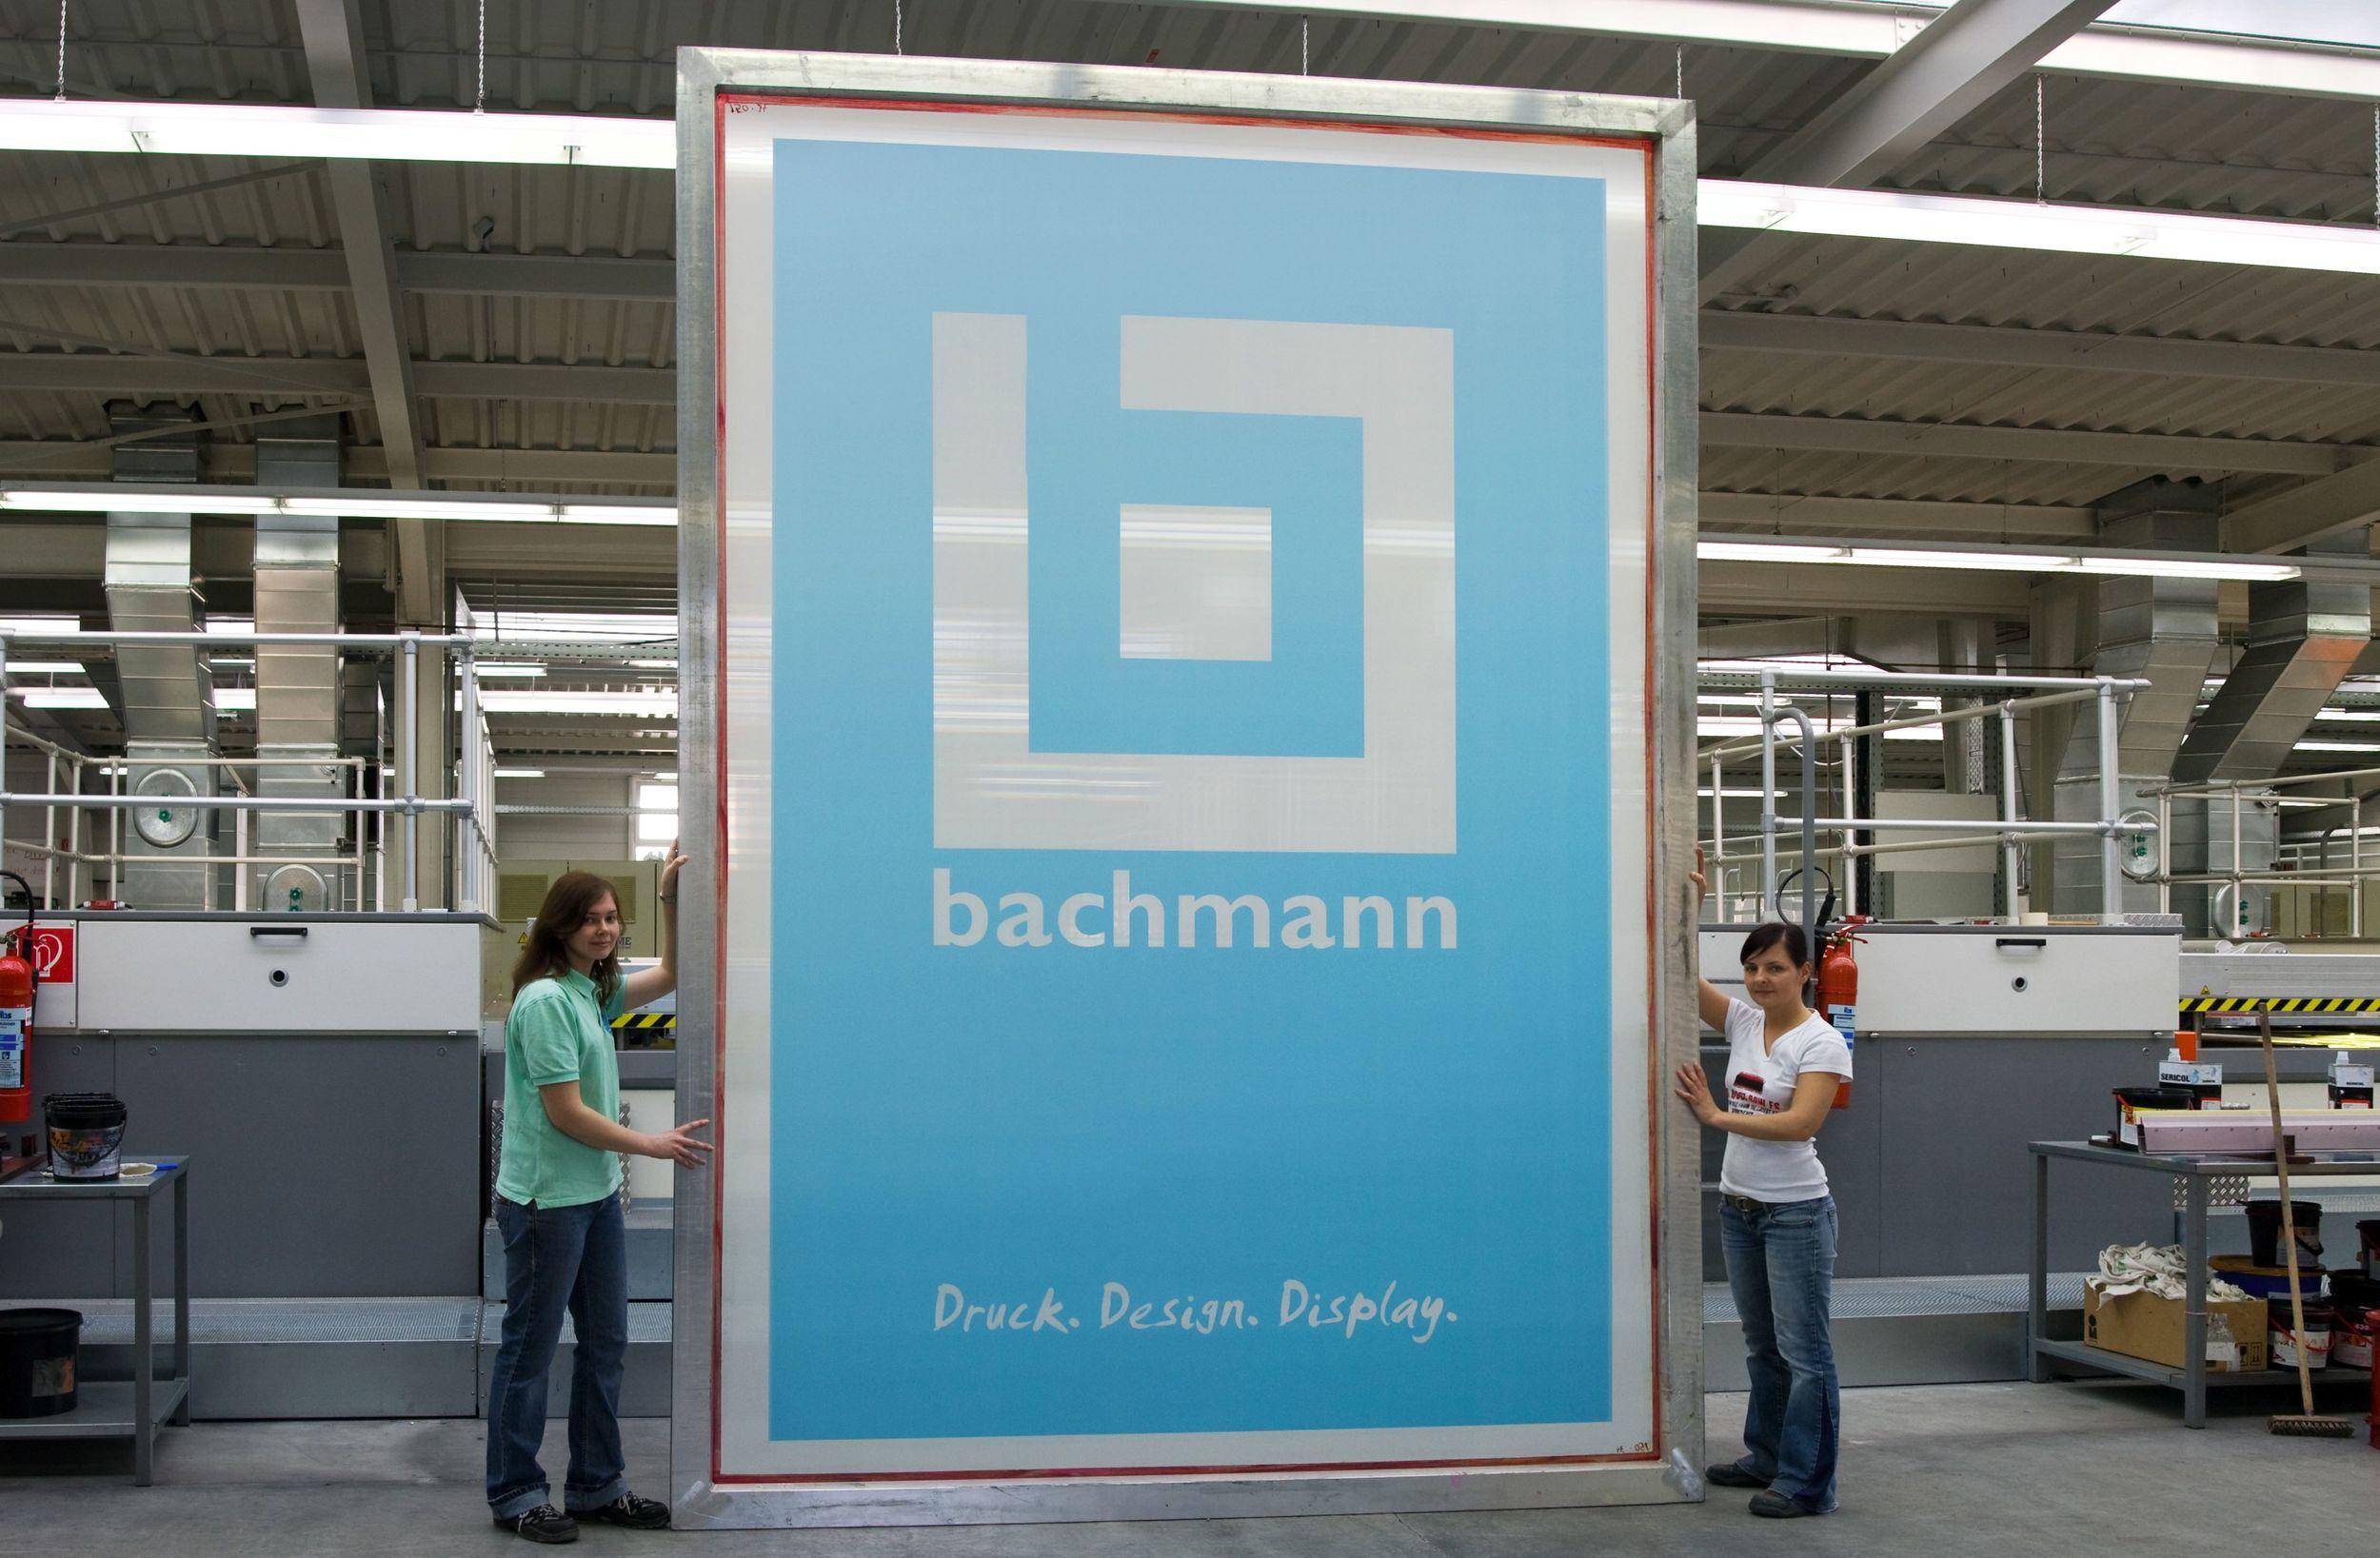 bachmannsieb_halle2cr.jpg